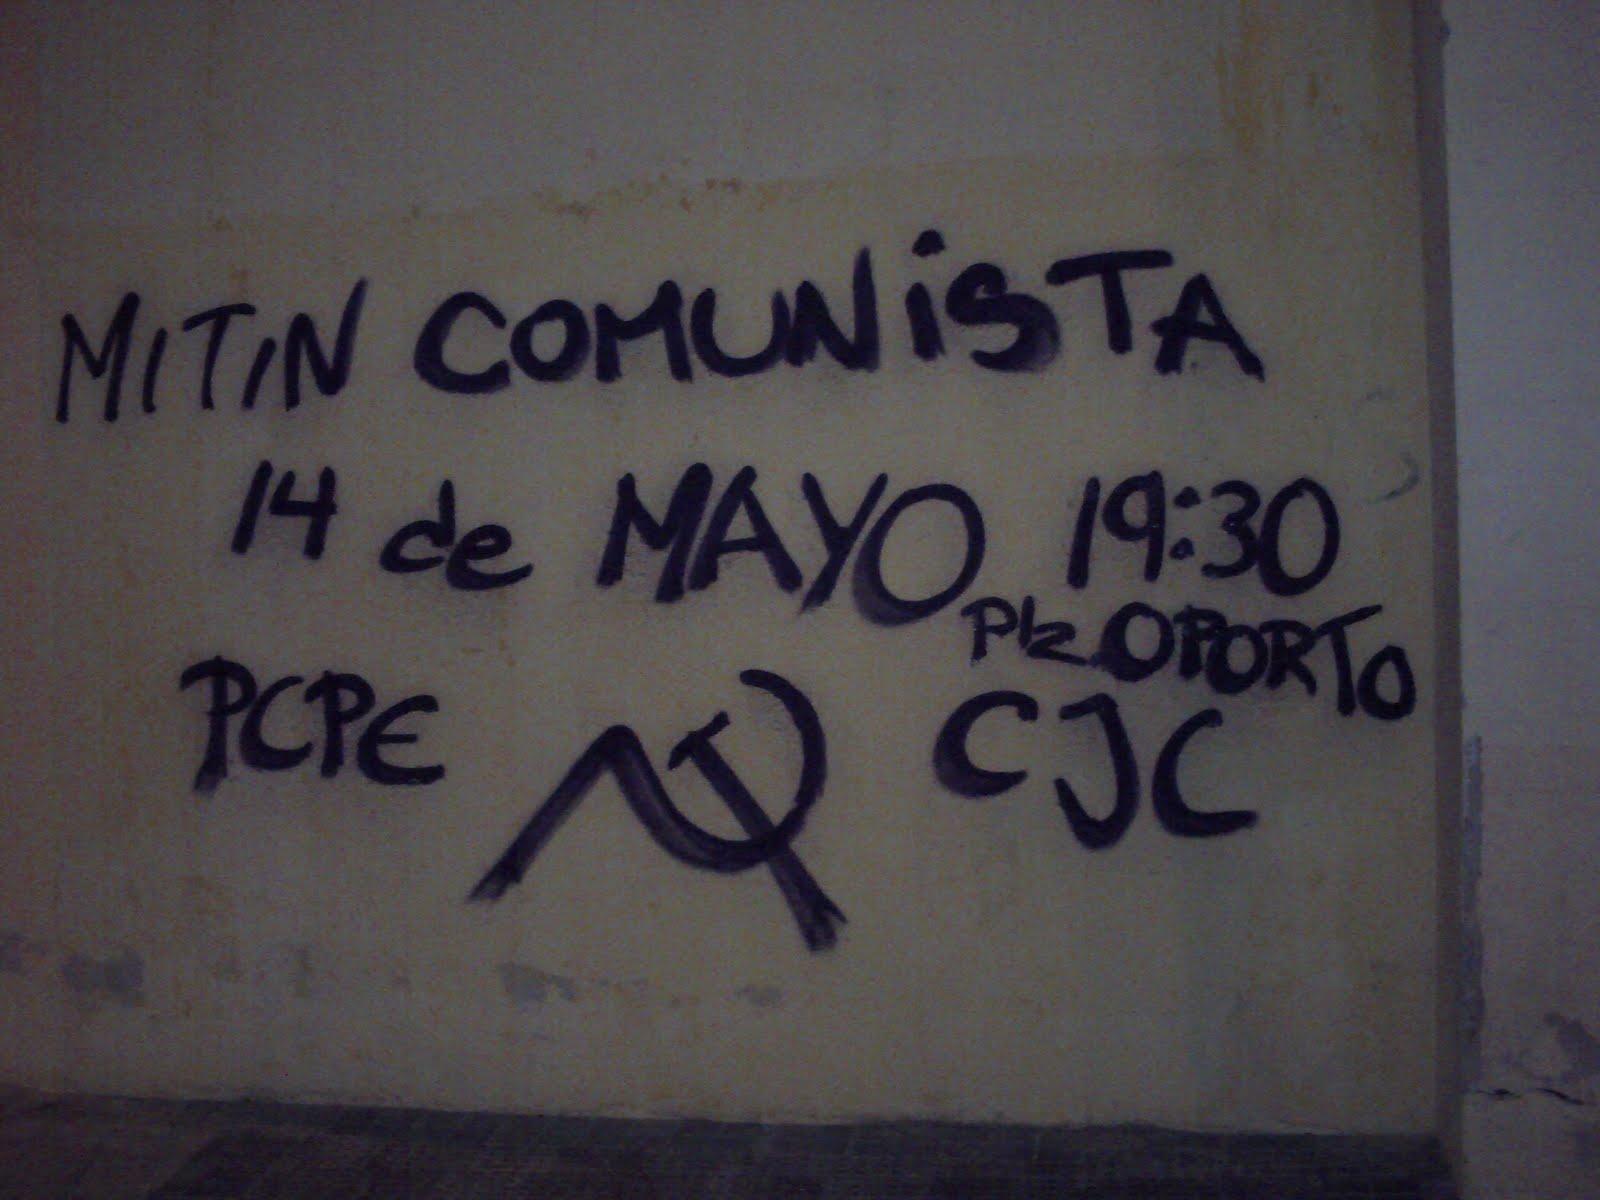 Mitin Comunista en Carabanchel PICT0008